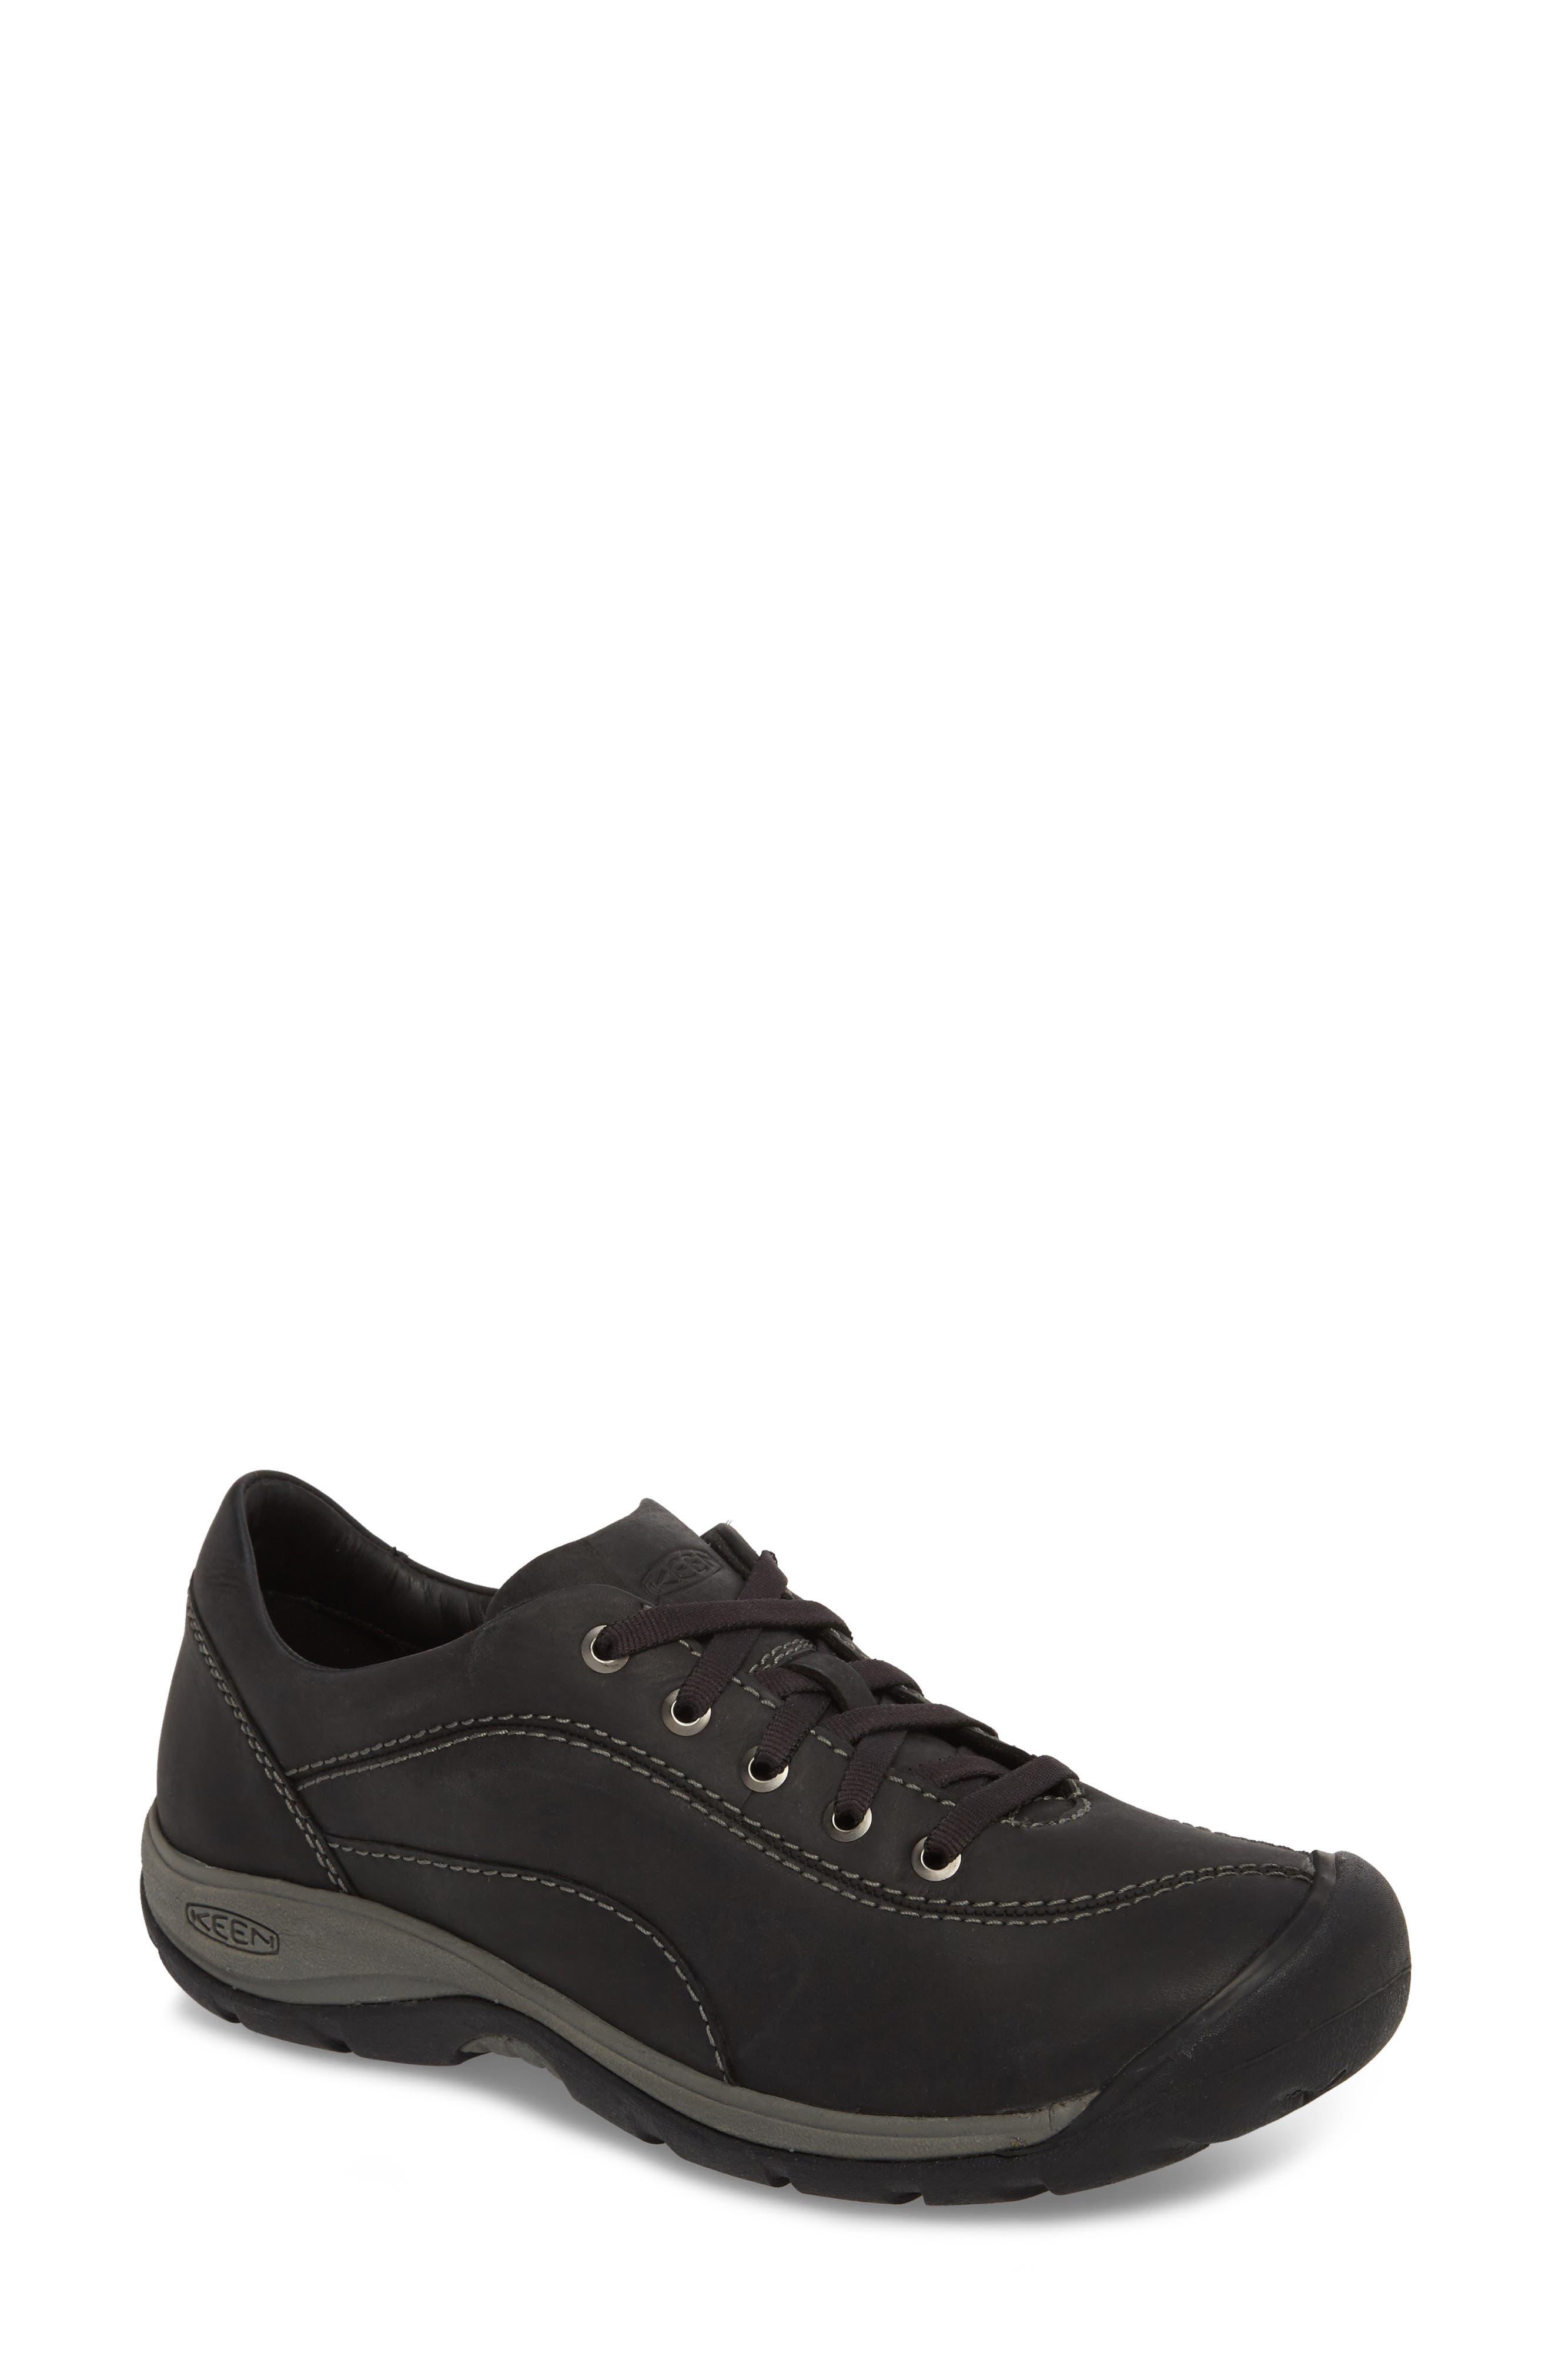 Presidio II Sneaker,                             Main thumbnail 1, color,                             Black/ Steel Grey Leather